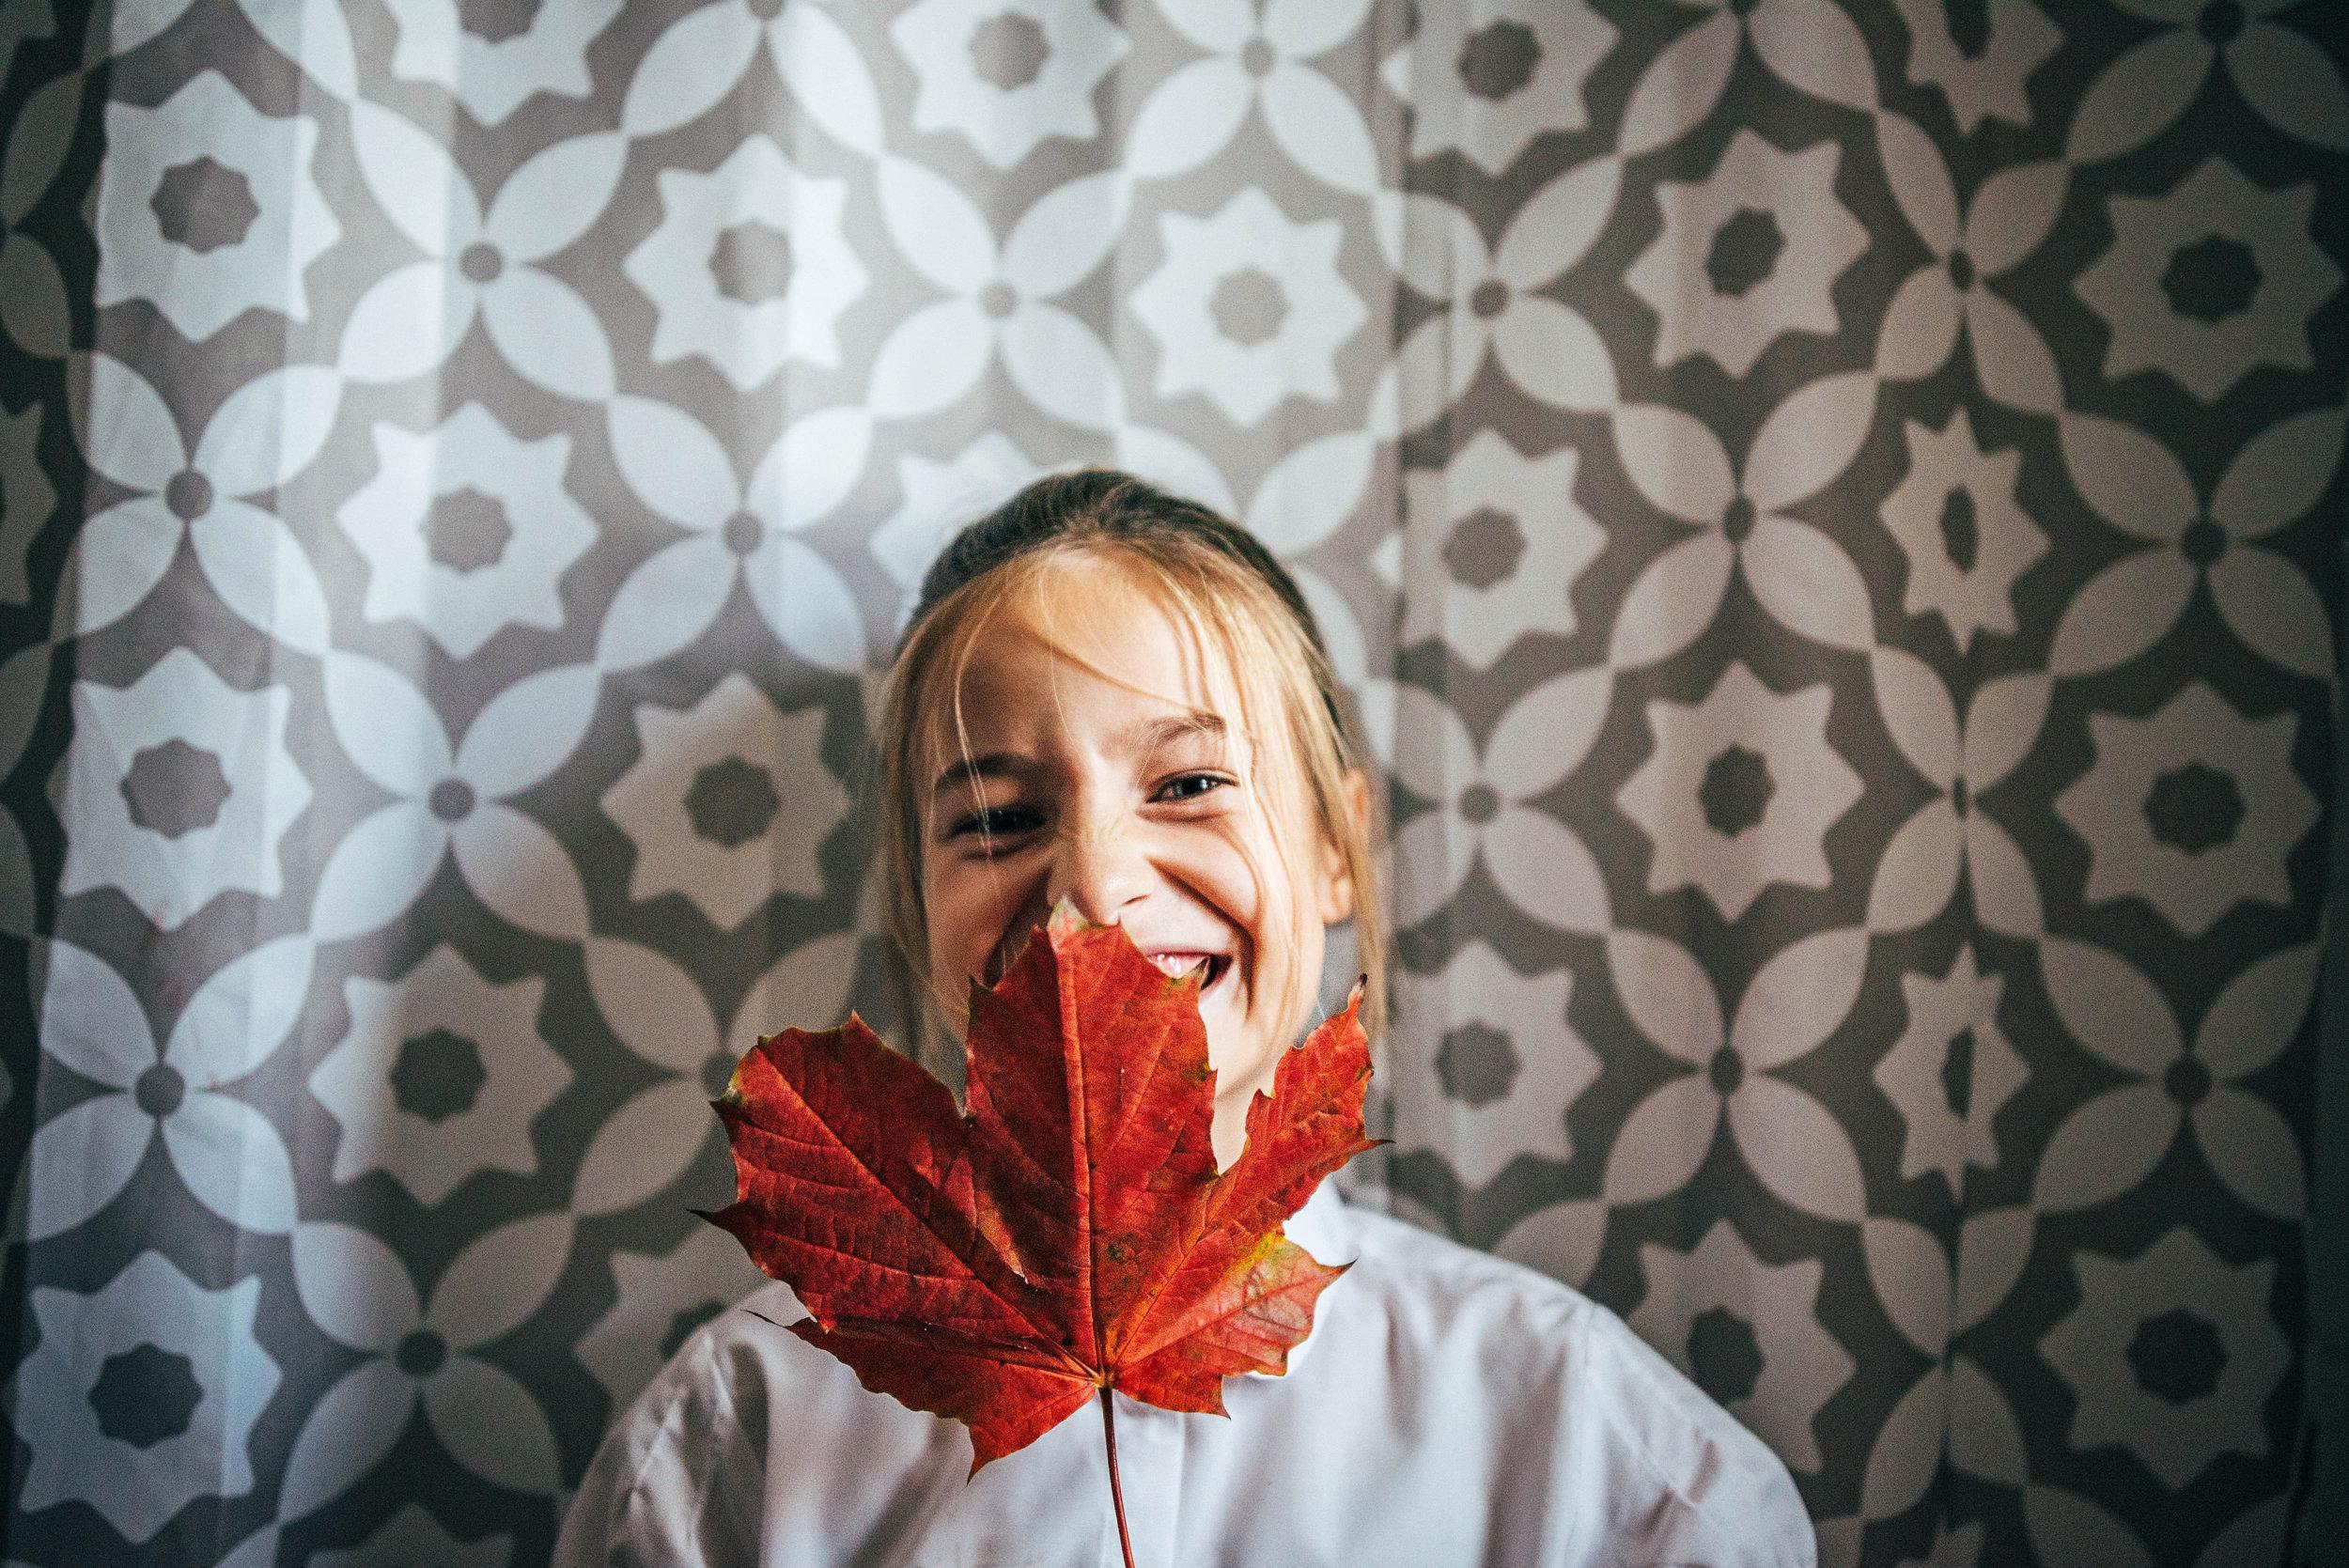 Little girl with Autumn Leaf Essex UK Documentary Lifestyle Portrait Photographer